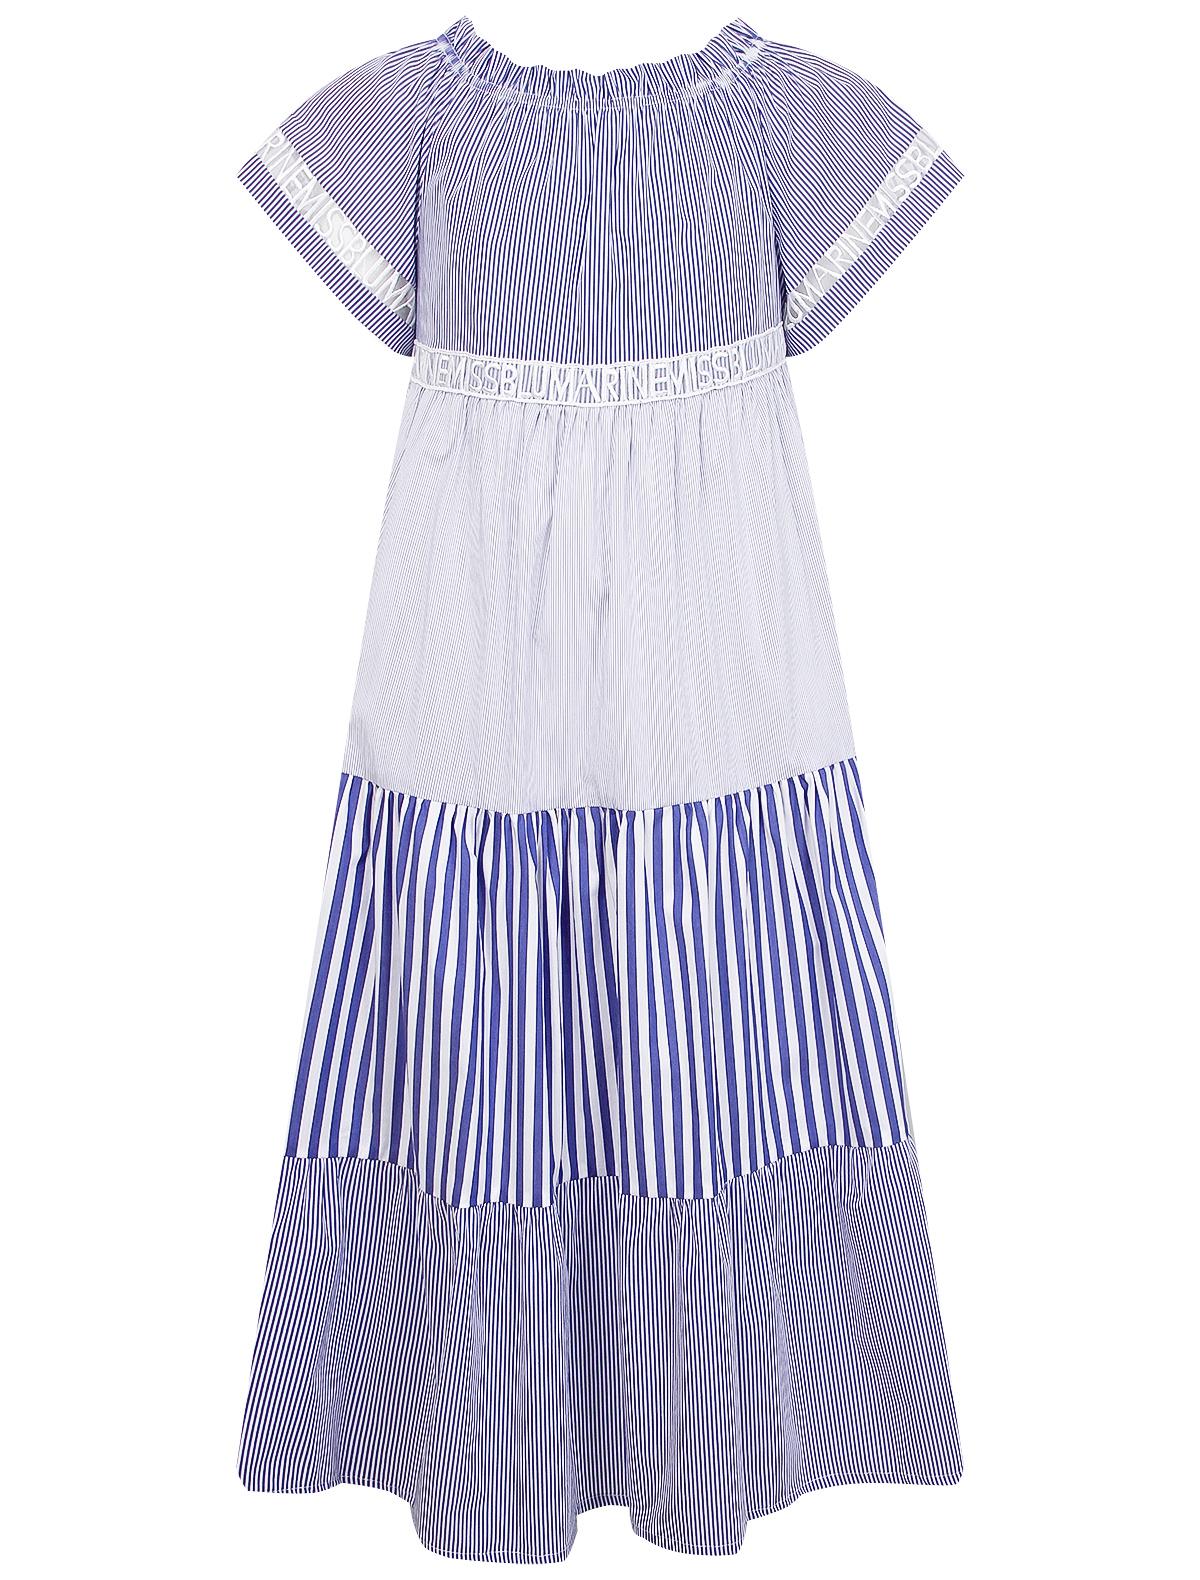 Платье Miss Blumarine цв. синий/белый, р. 134